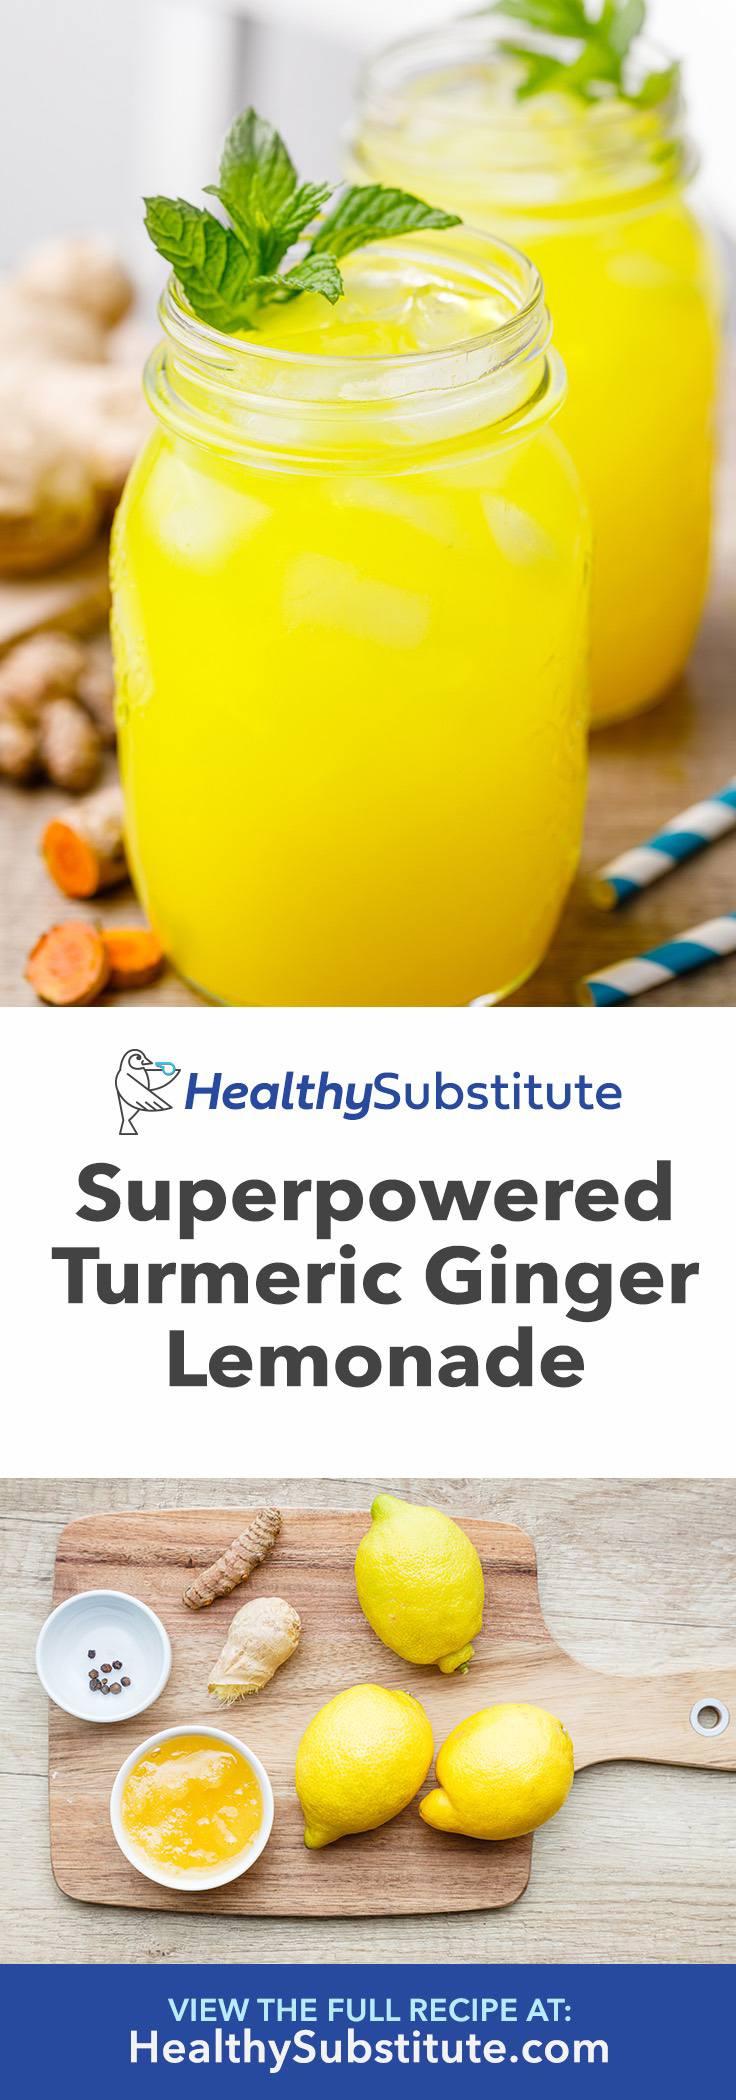 Superpowered Fresh Turmeric Ginger Lemonade